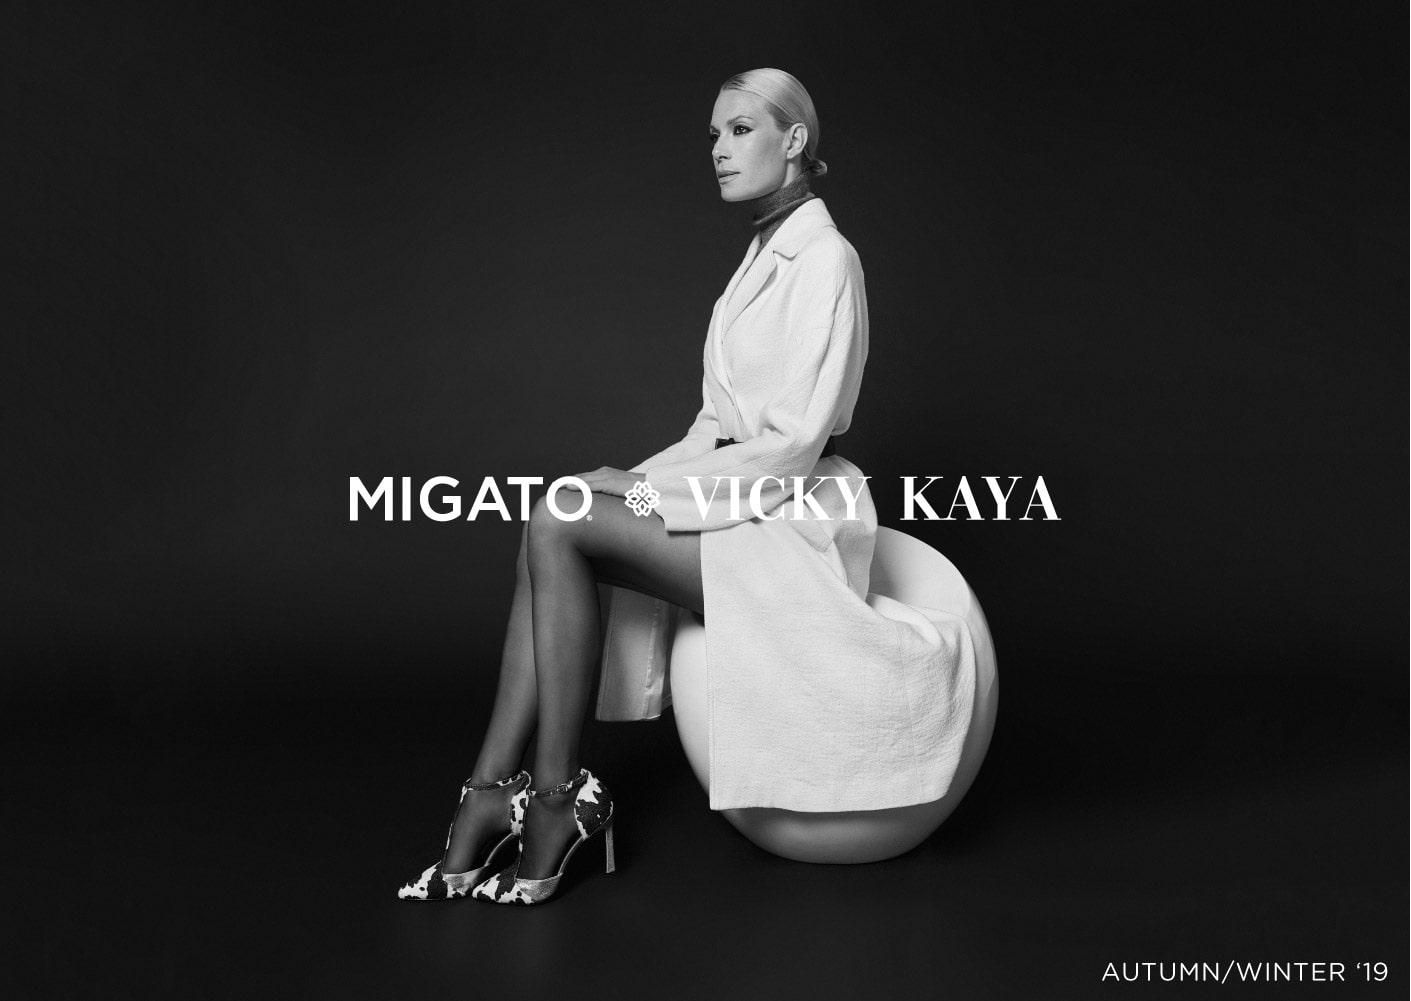 MIGATO Vicky Kaya AW19 Campaign